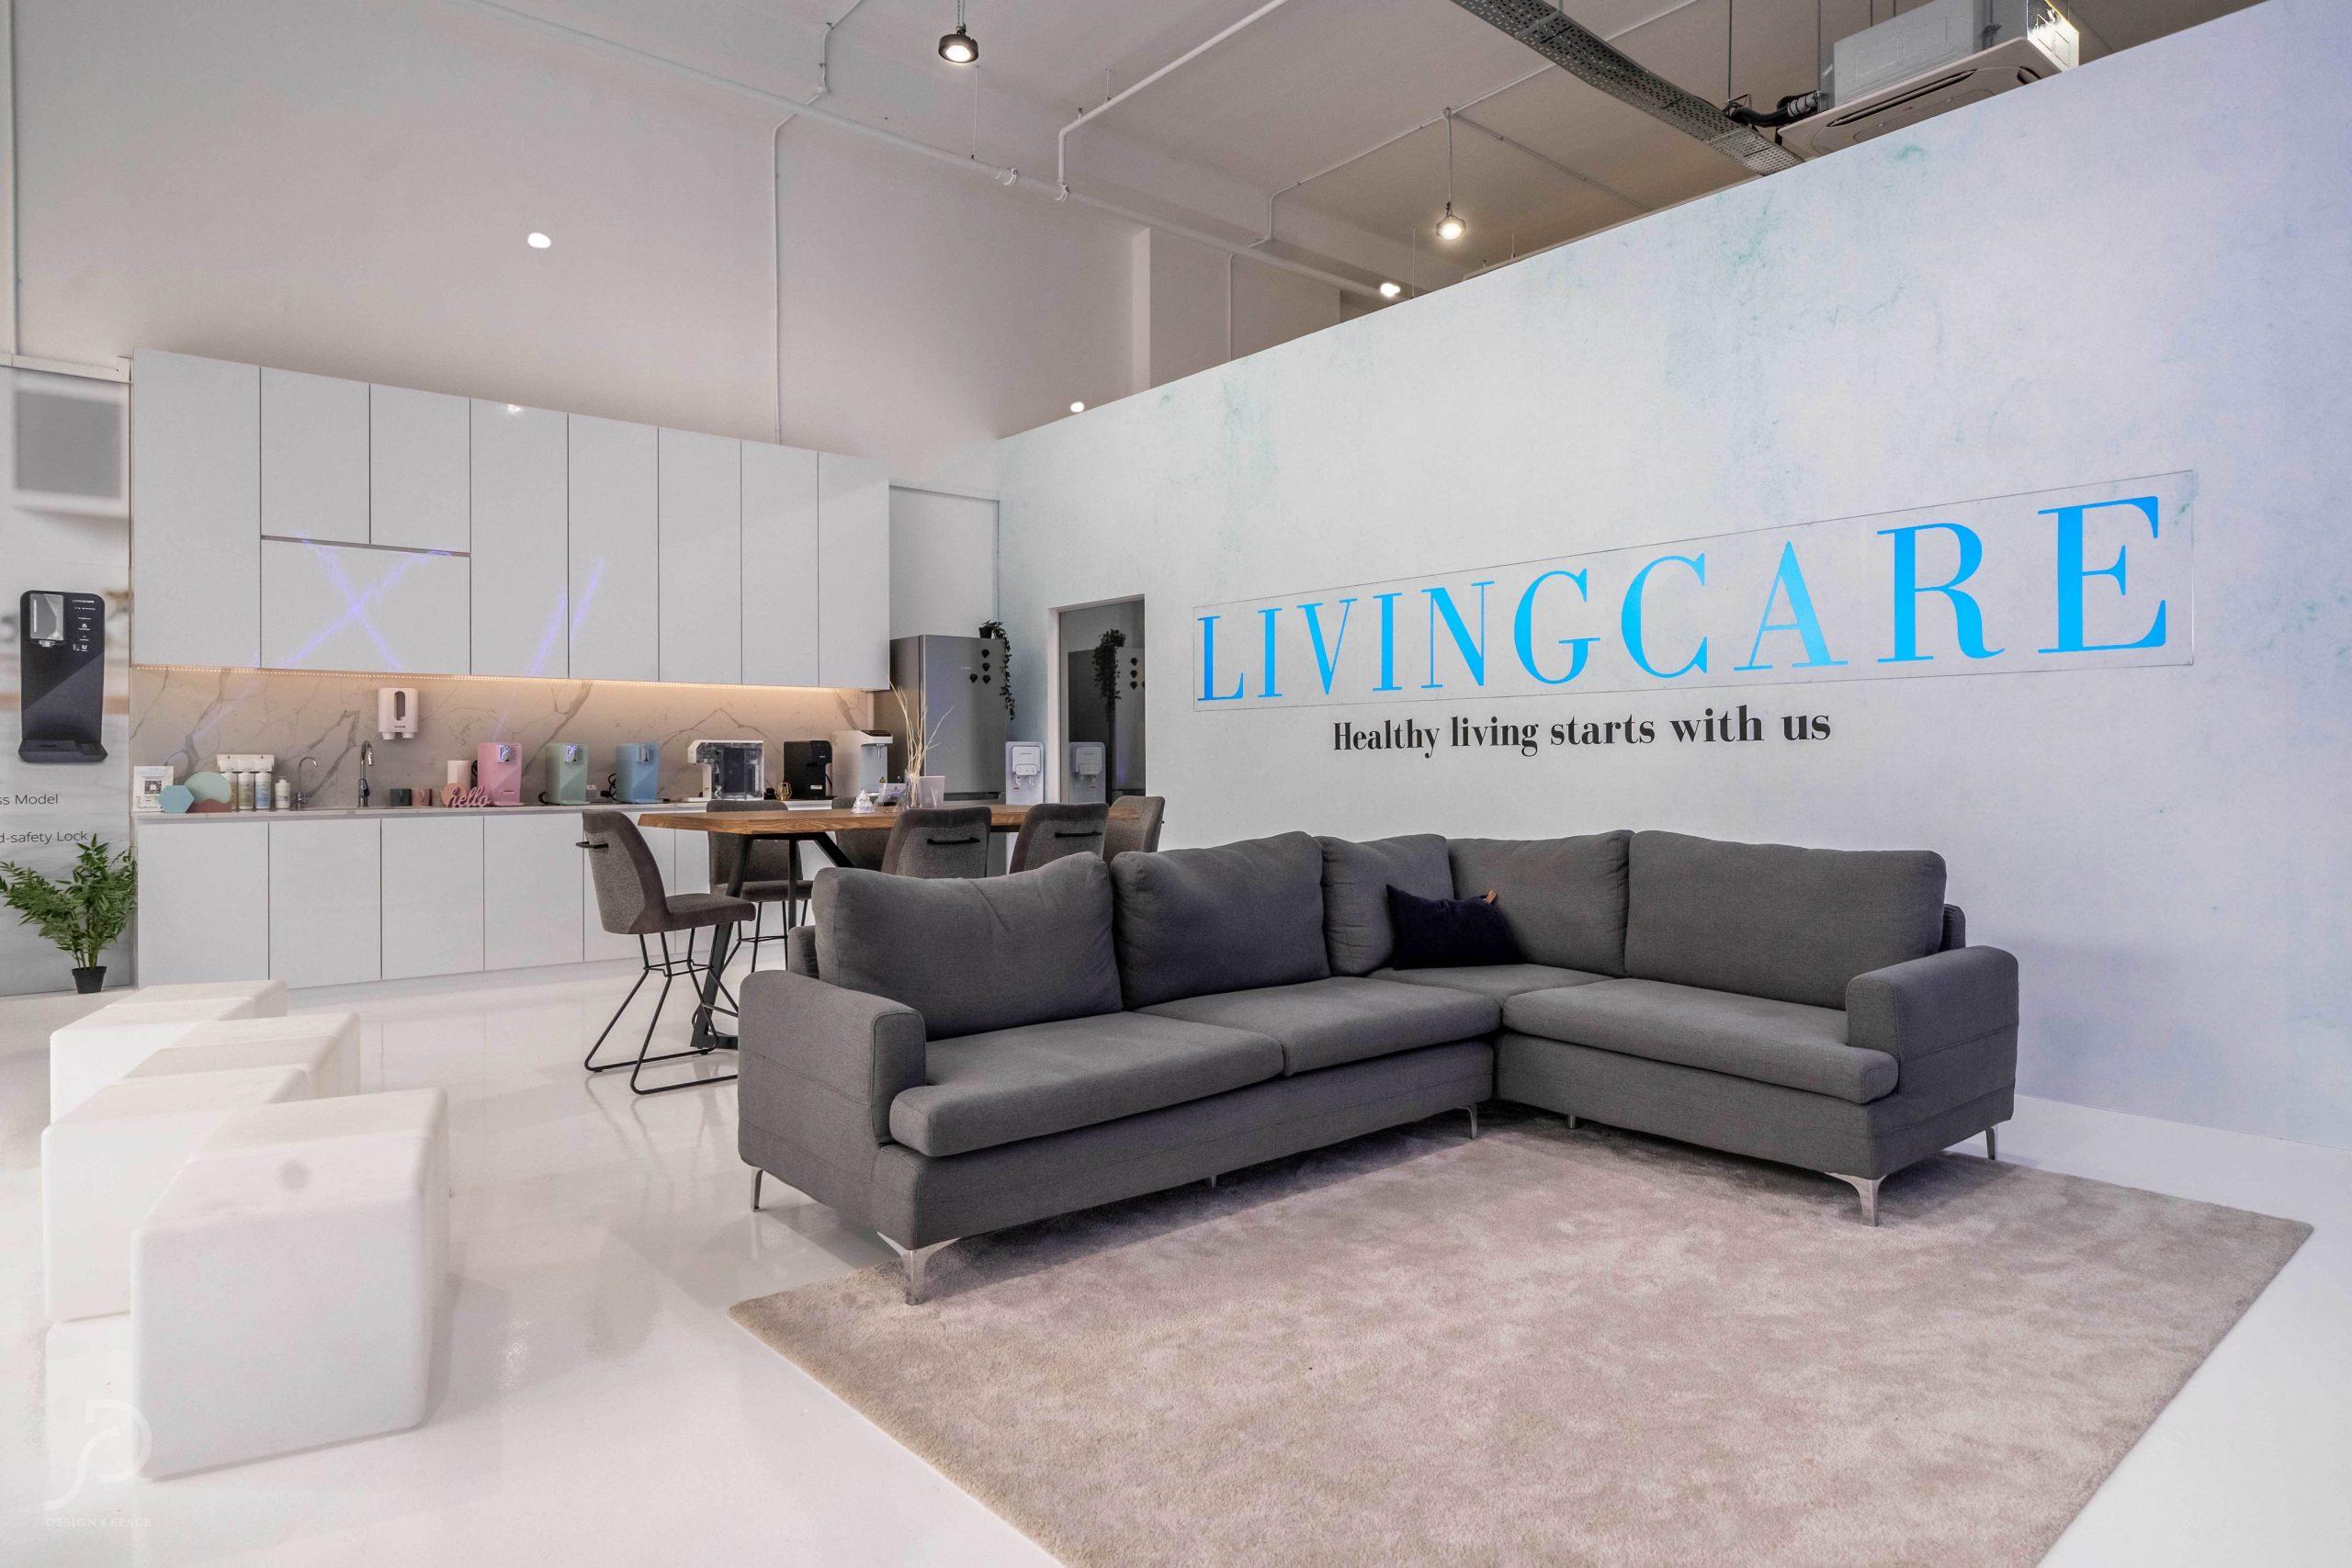 Living care15